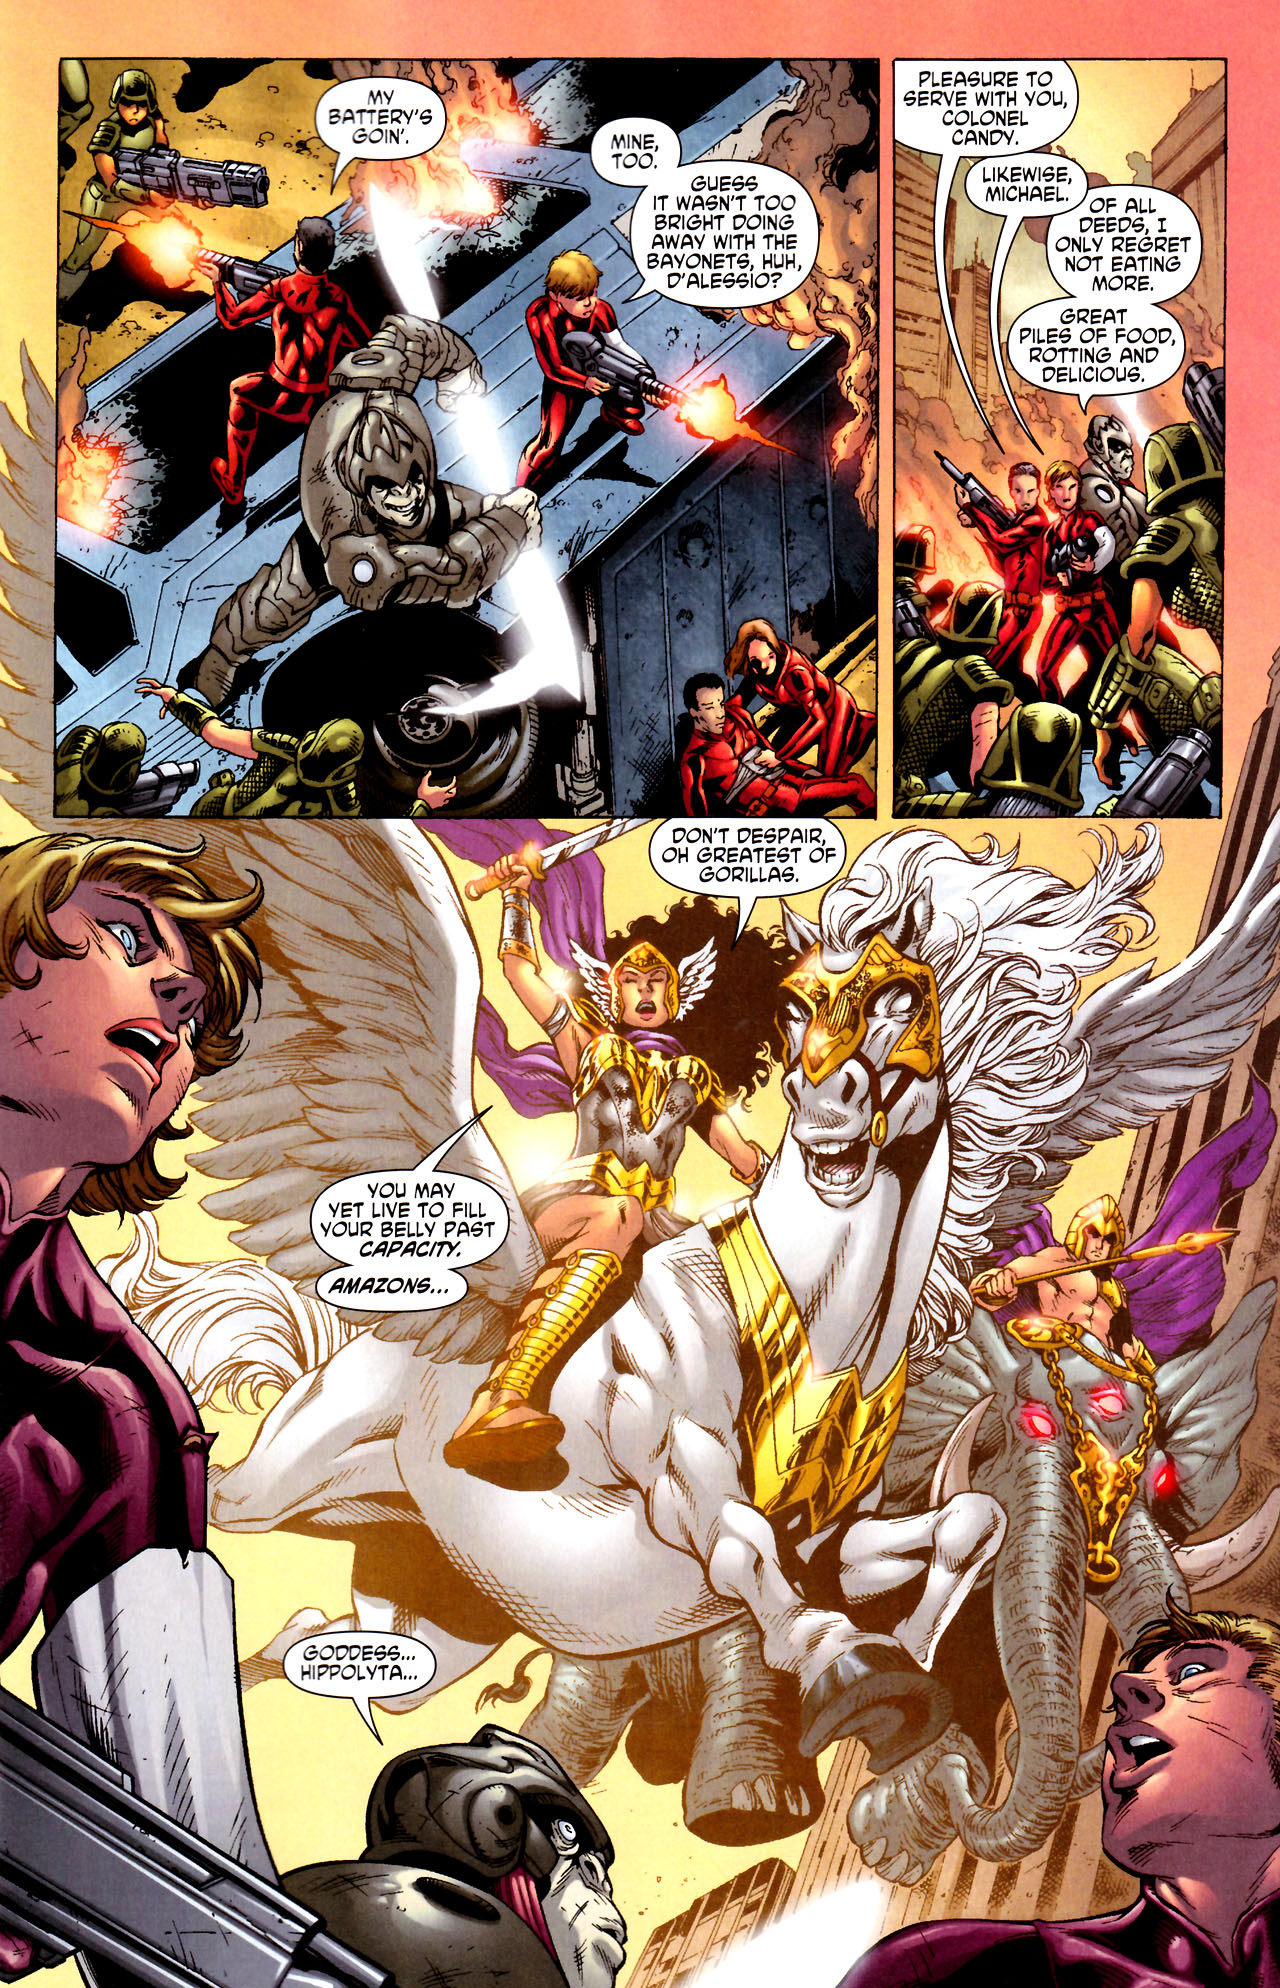 Read online Wonder Woman (2006) comic -  Issue #44 - 19